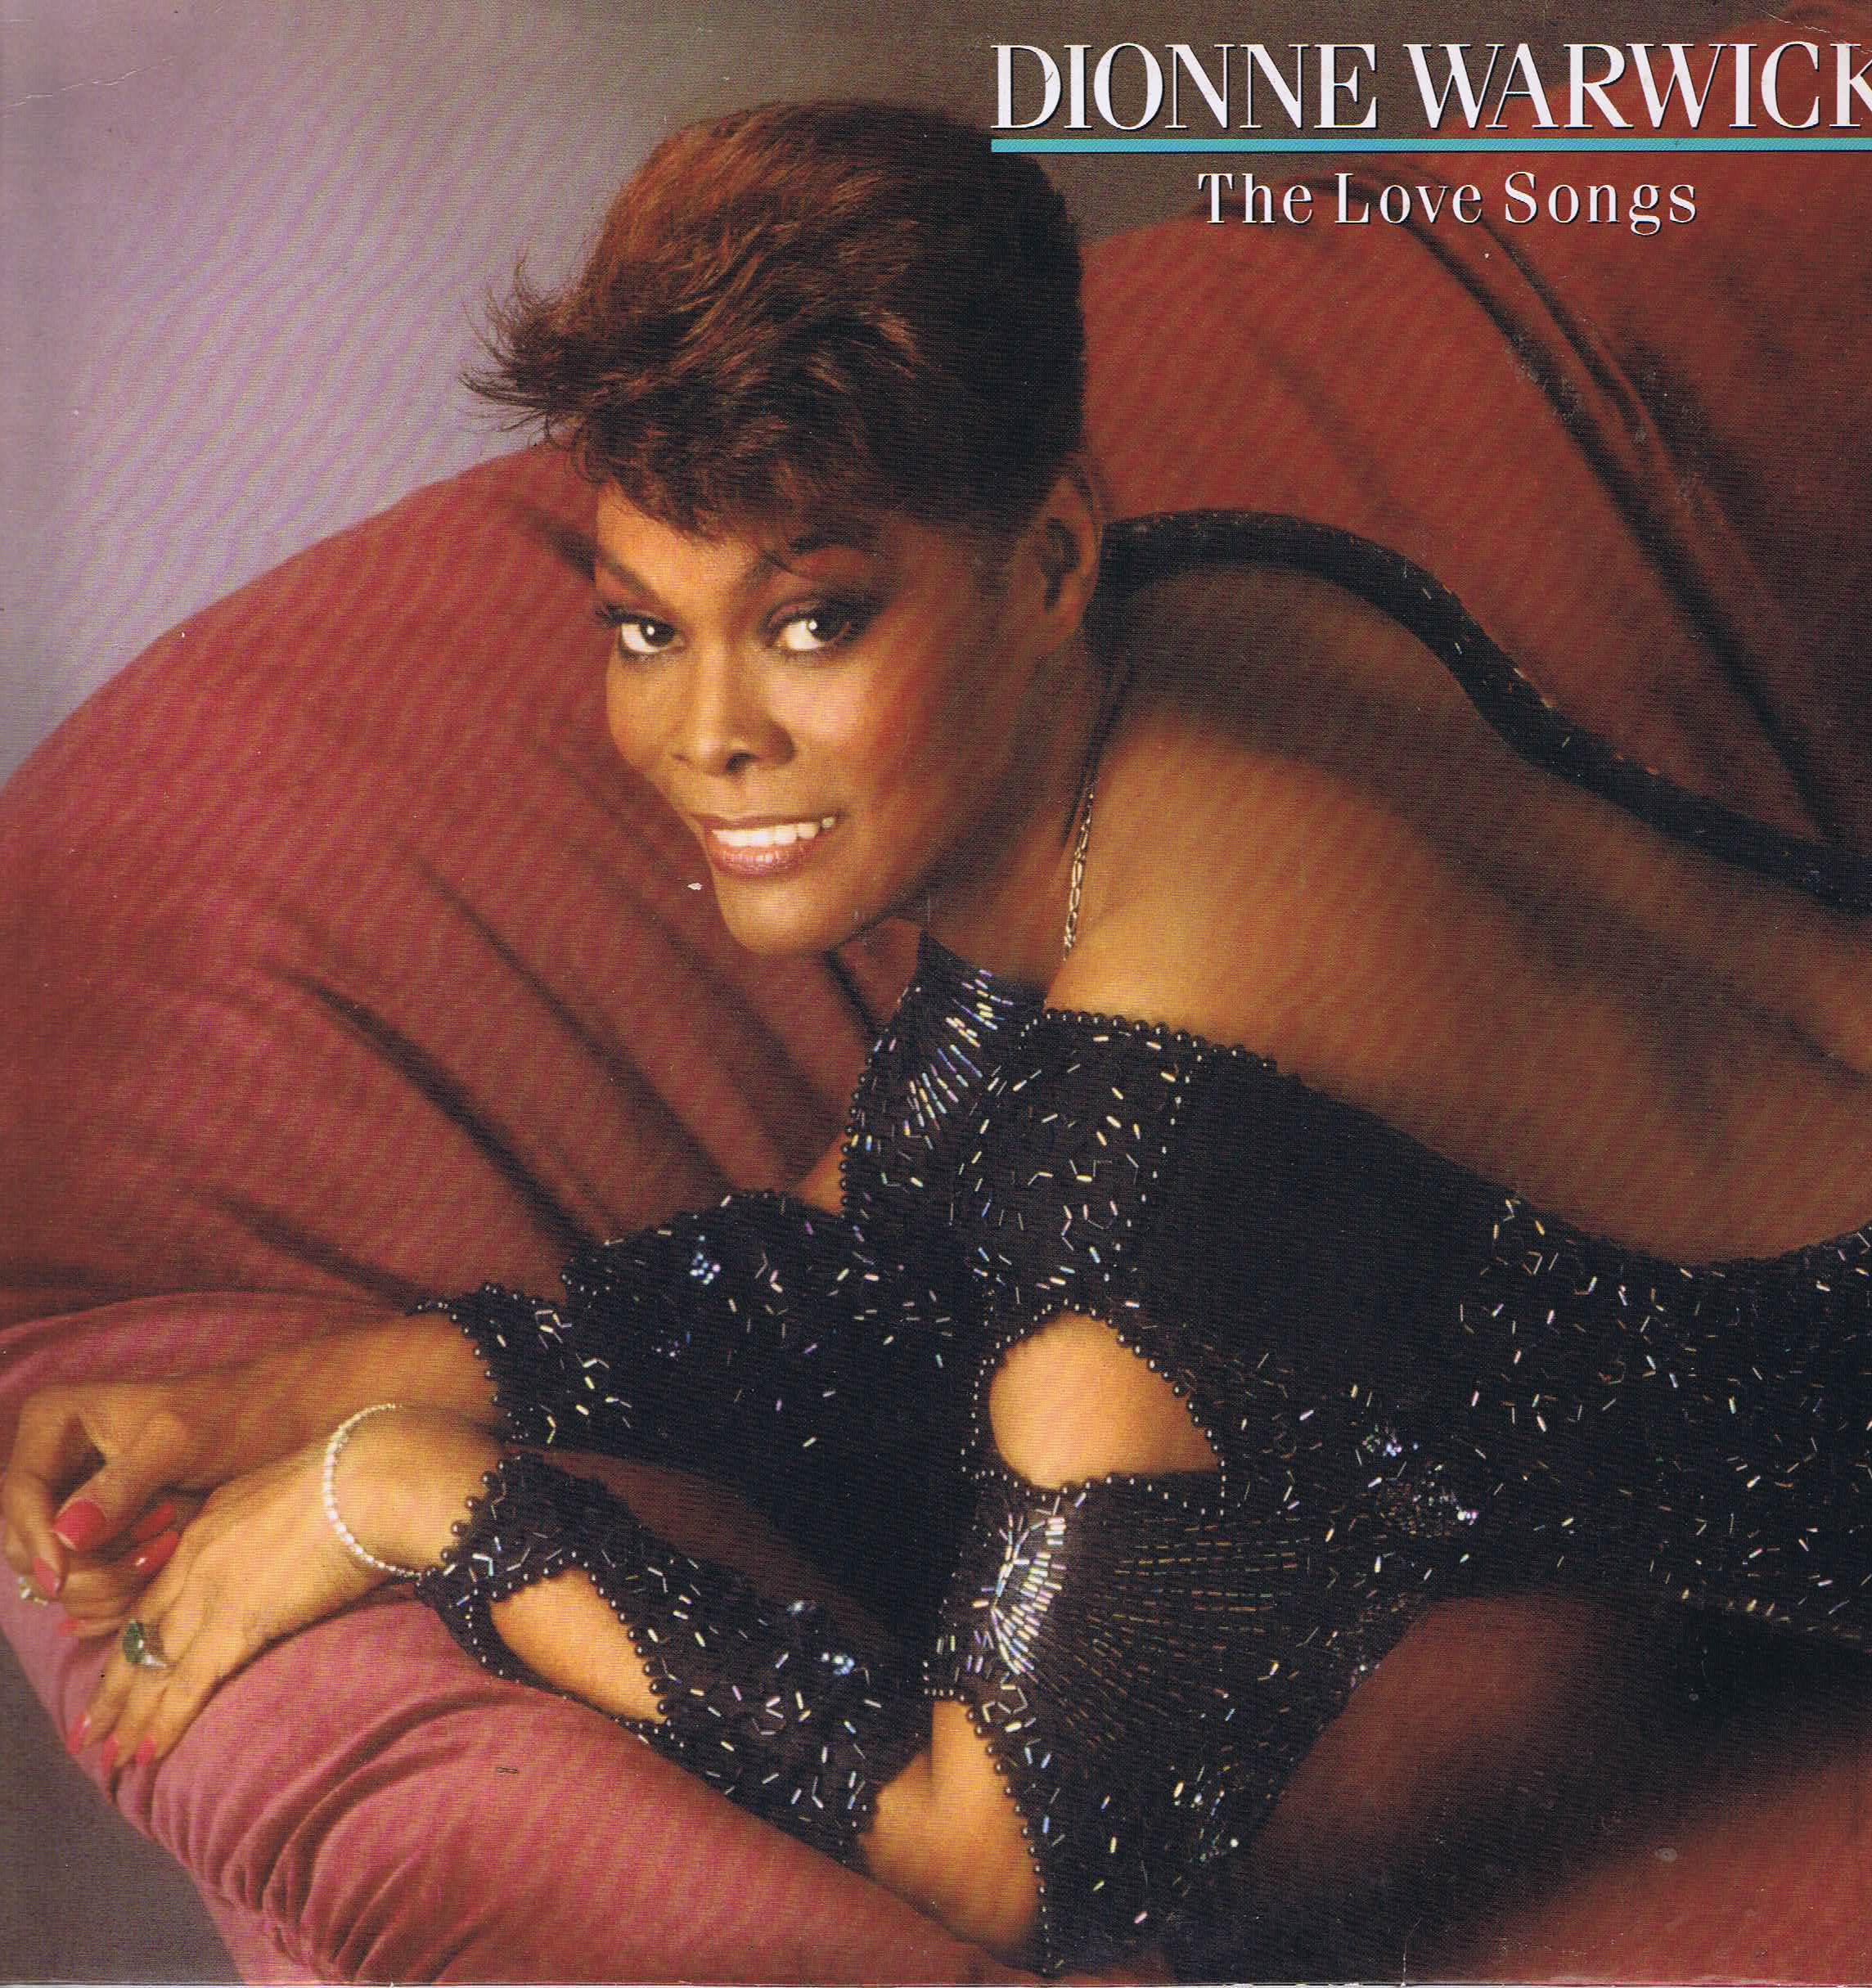 Dionne Warwick – The Love Songs - Arista 210 441 - LP Vinyl Record